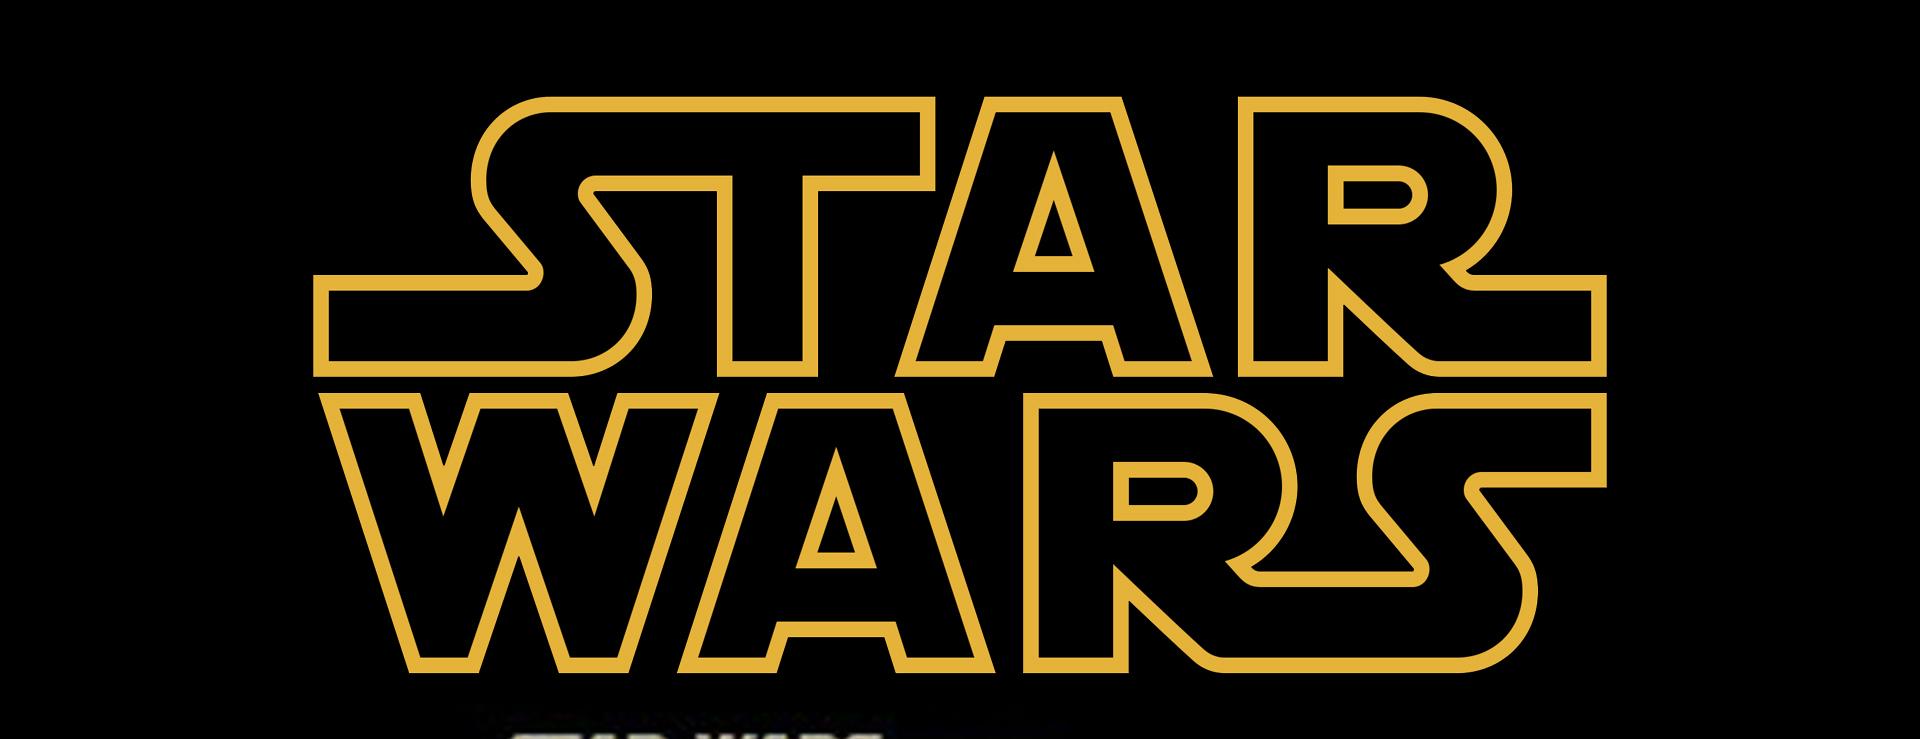 Star wars vii deux personnages d voil s brain damaged - Personnage star wars 7 ...